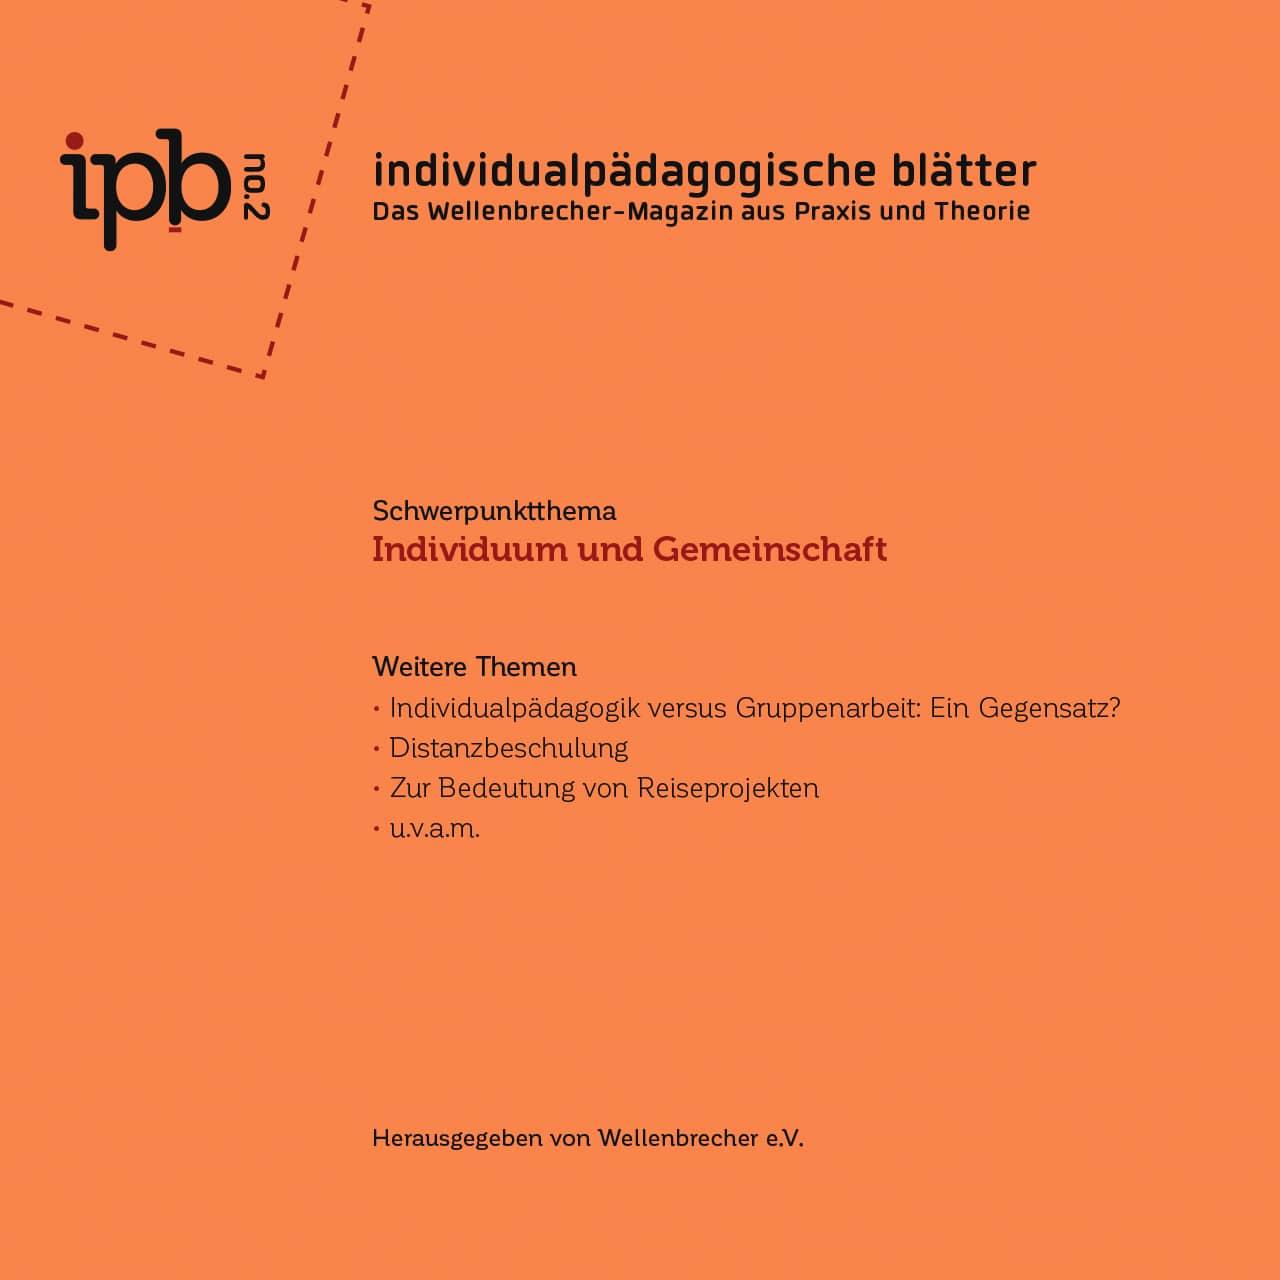 Individualpädagogische Blätter Nr. 2